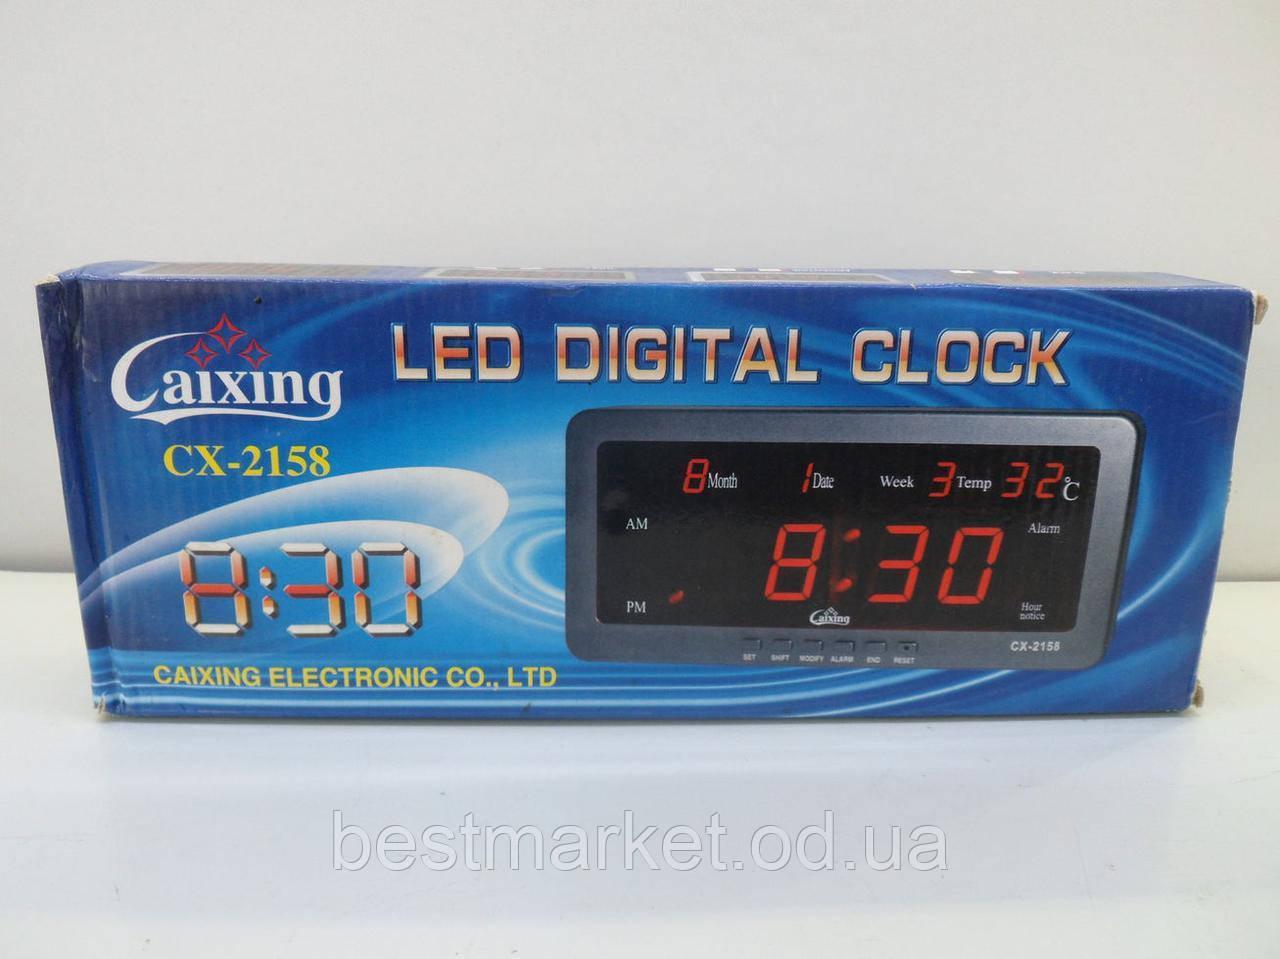 Настольные часы CX 2158 электронные Led Digital часы с будильником